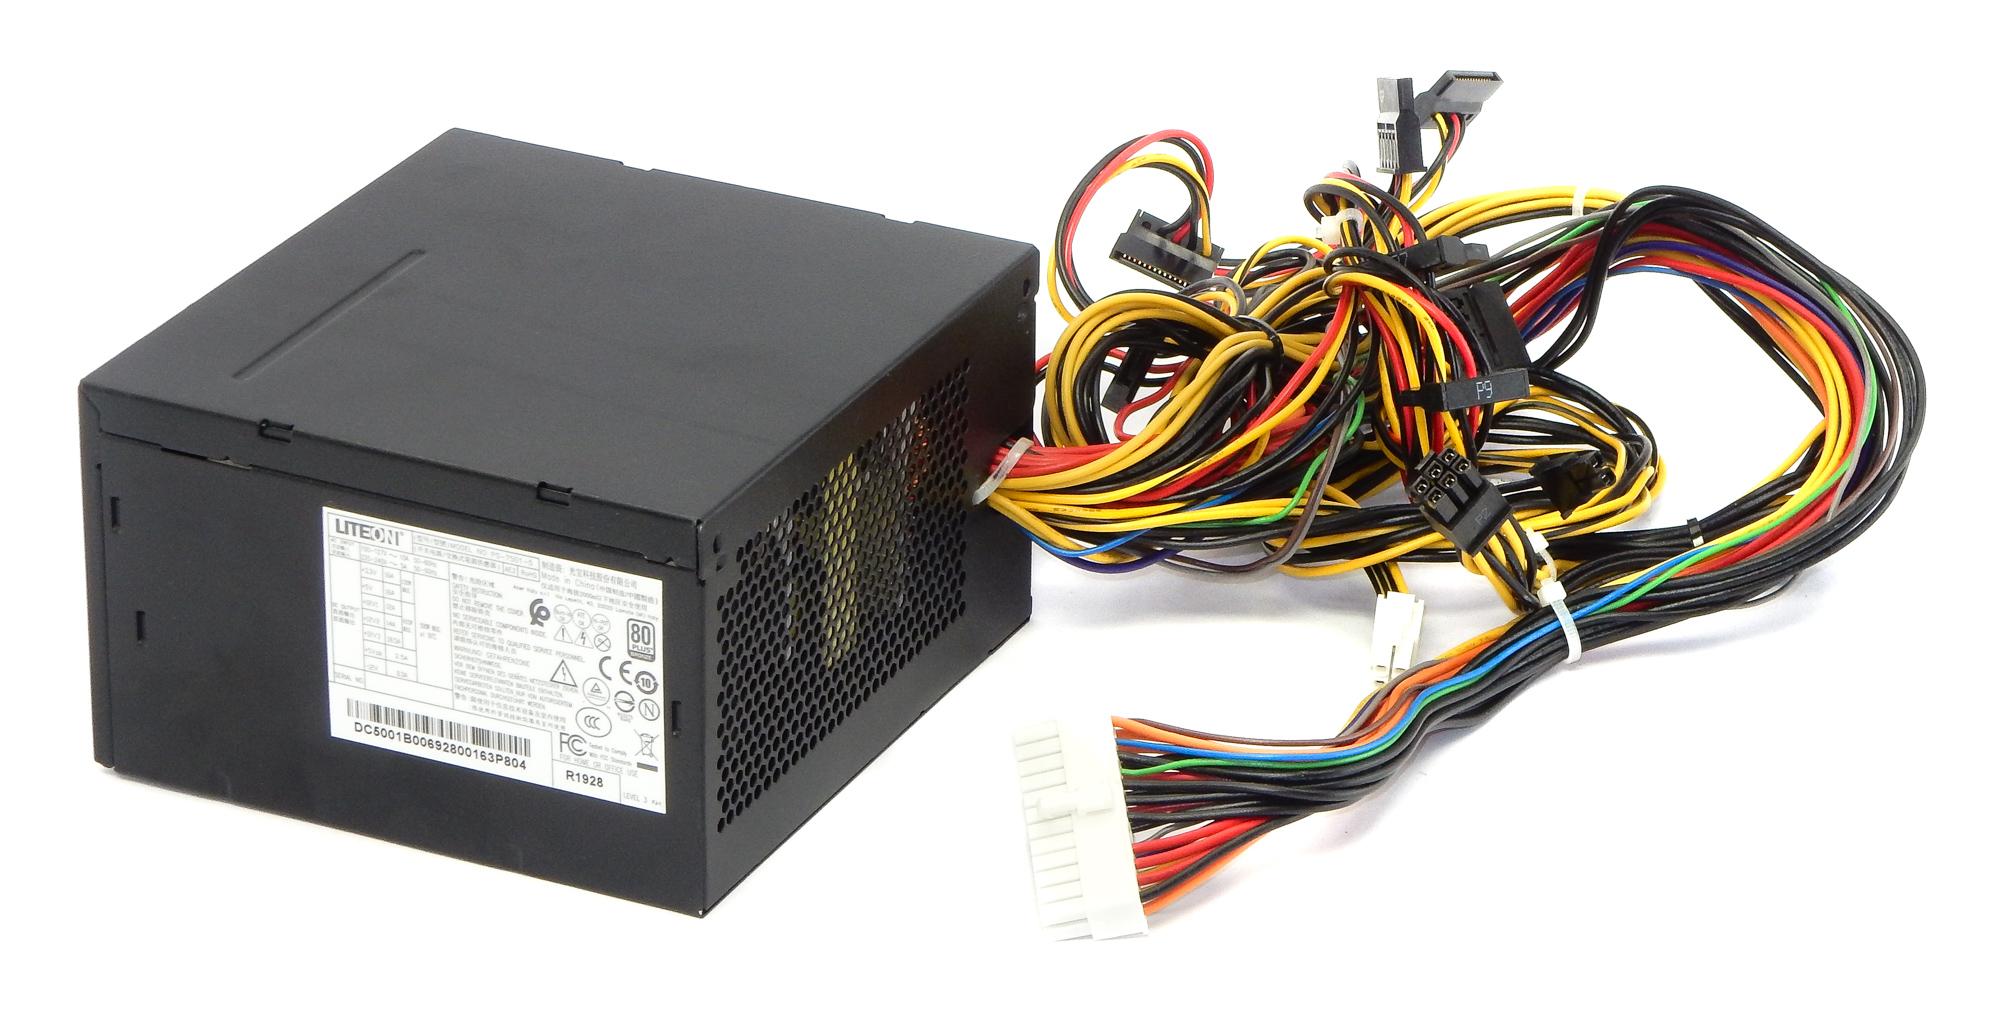 DC.5001B.006 LiteOn PS-7501-5AF 500W ATX Power Supply